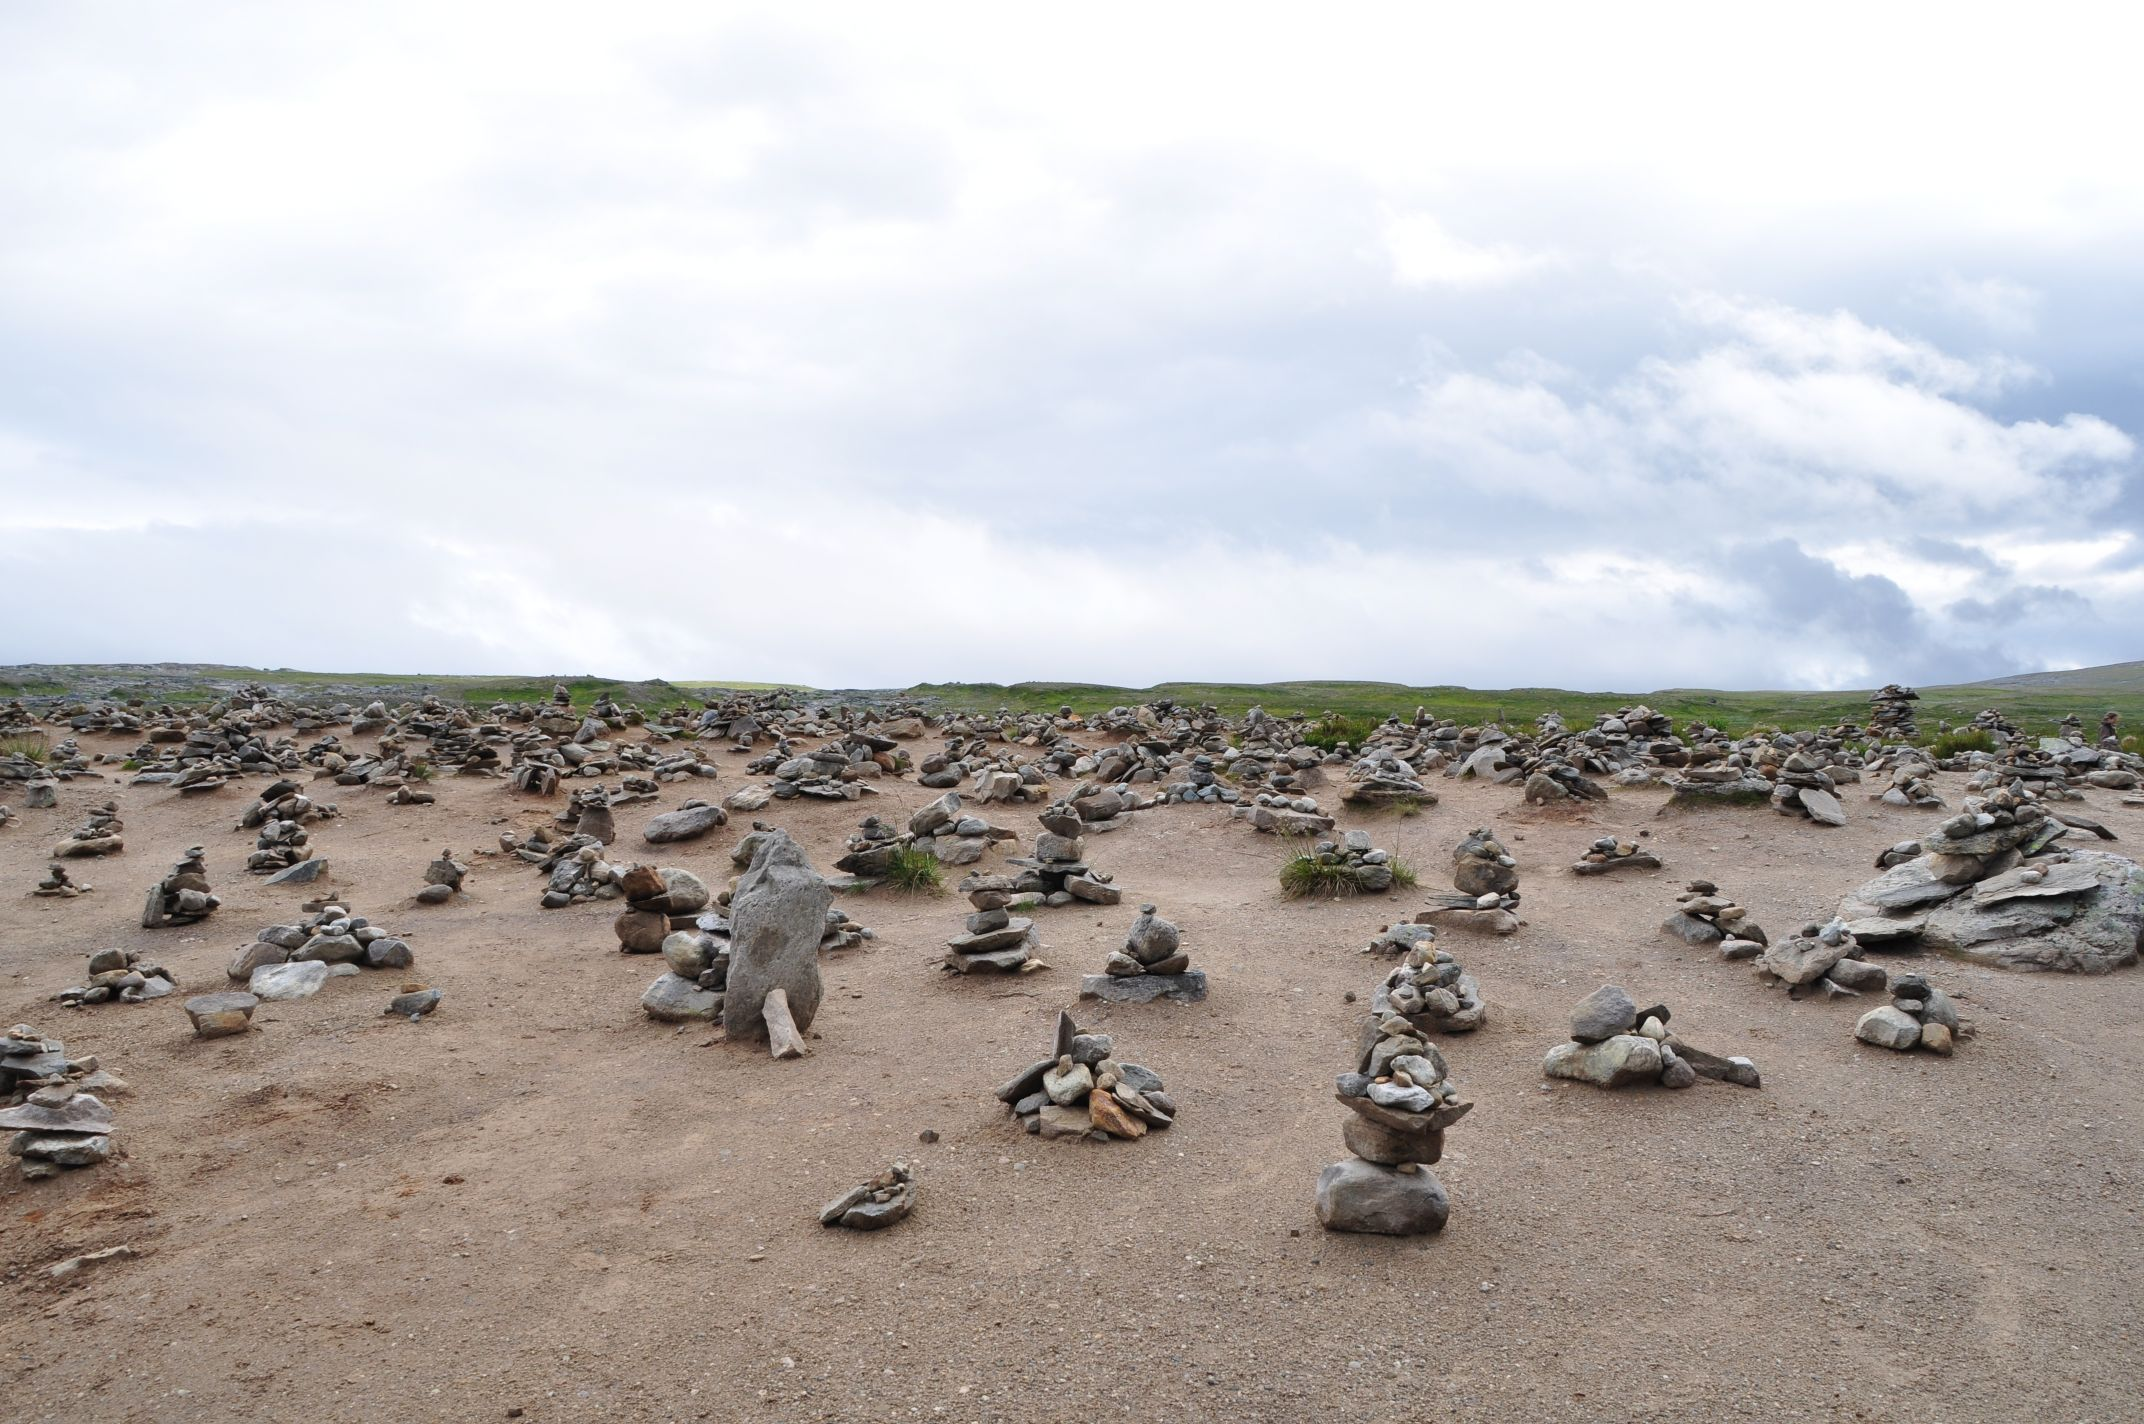 hunderte Steinmännchen